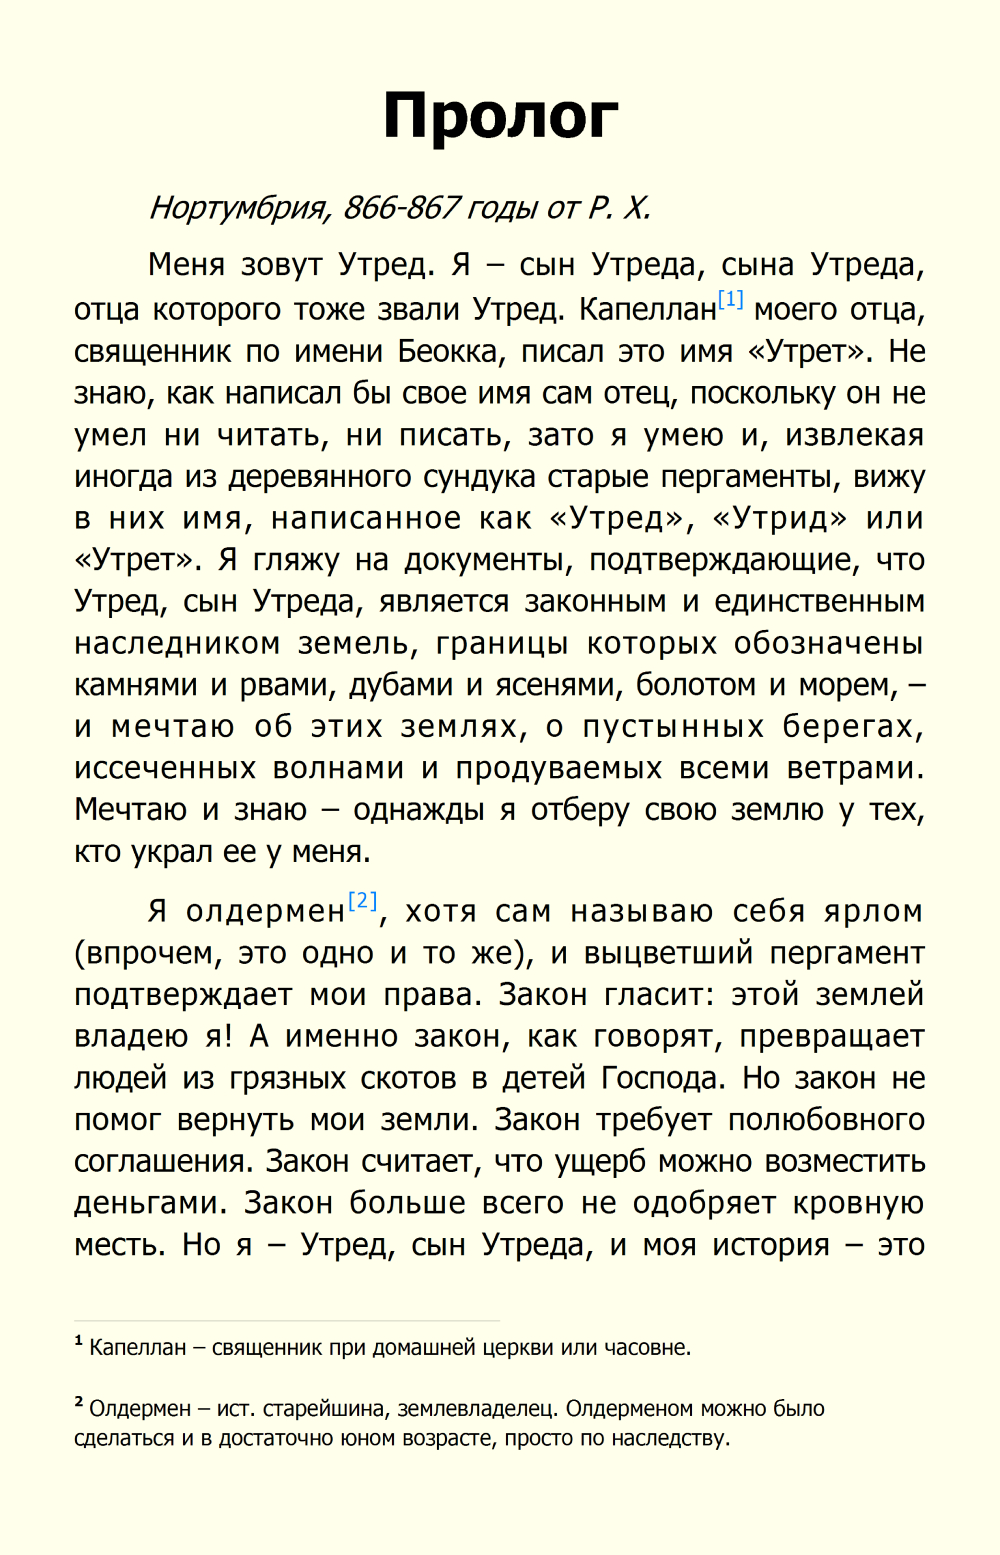 http://i5.imageban.ru/out/2013/11/12/21e8673c919437d209e030f69600eee5.jpg